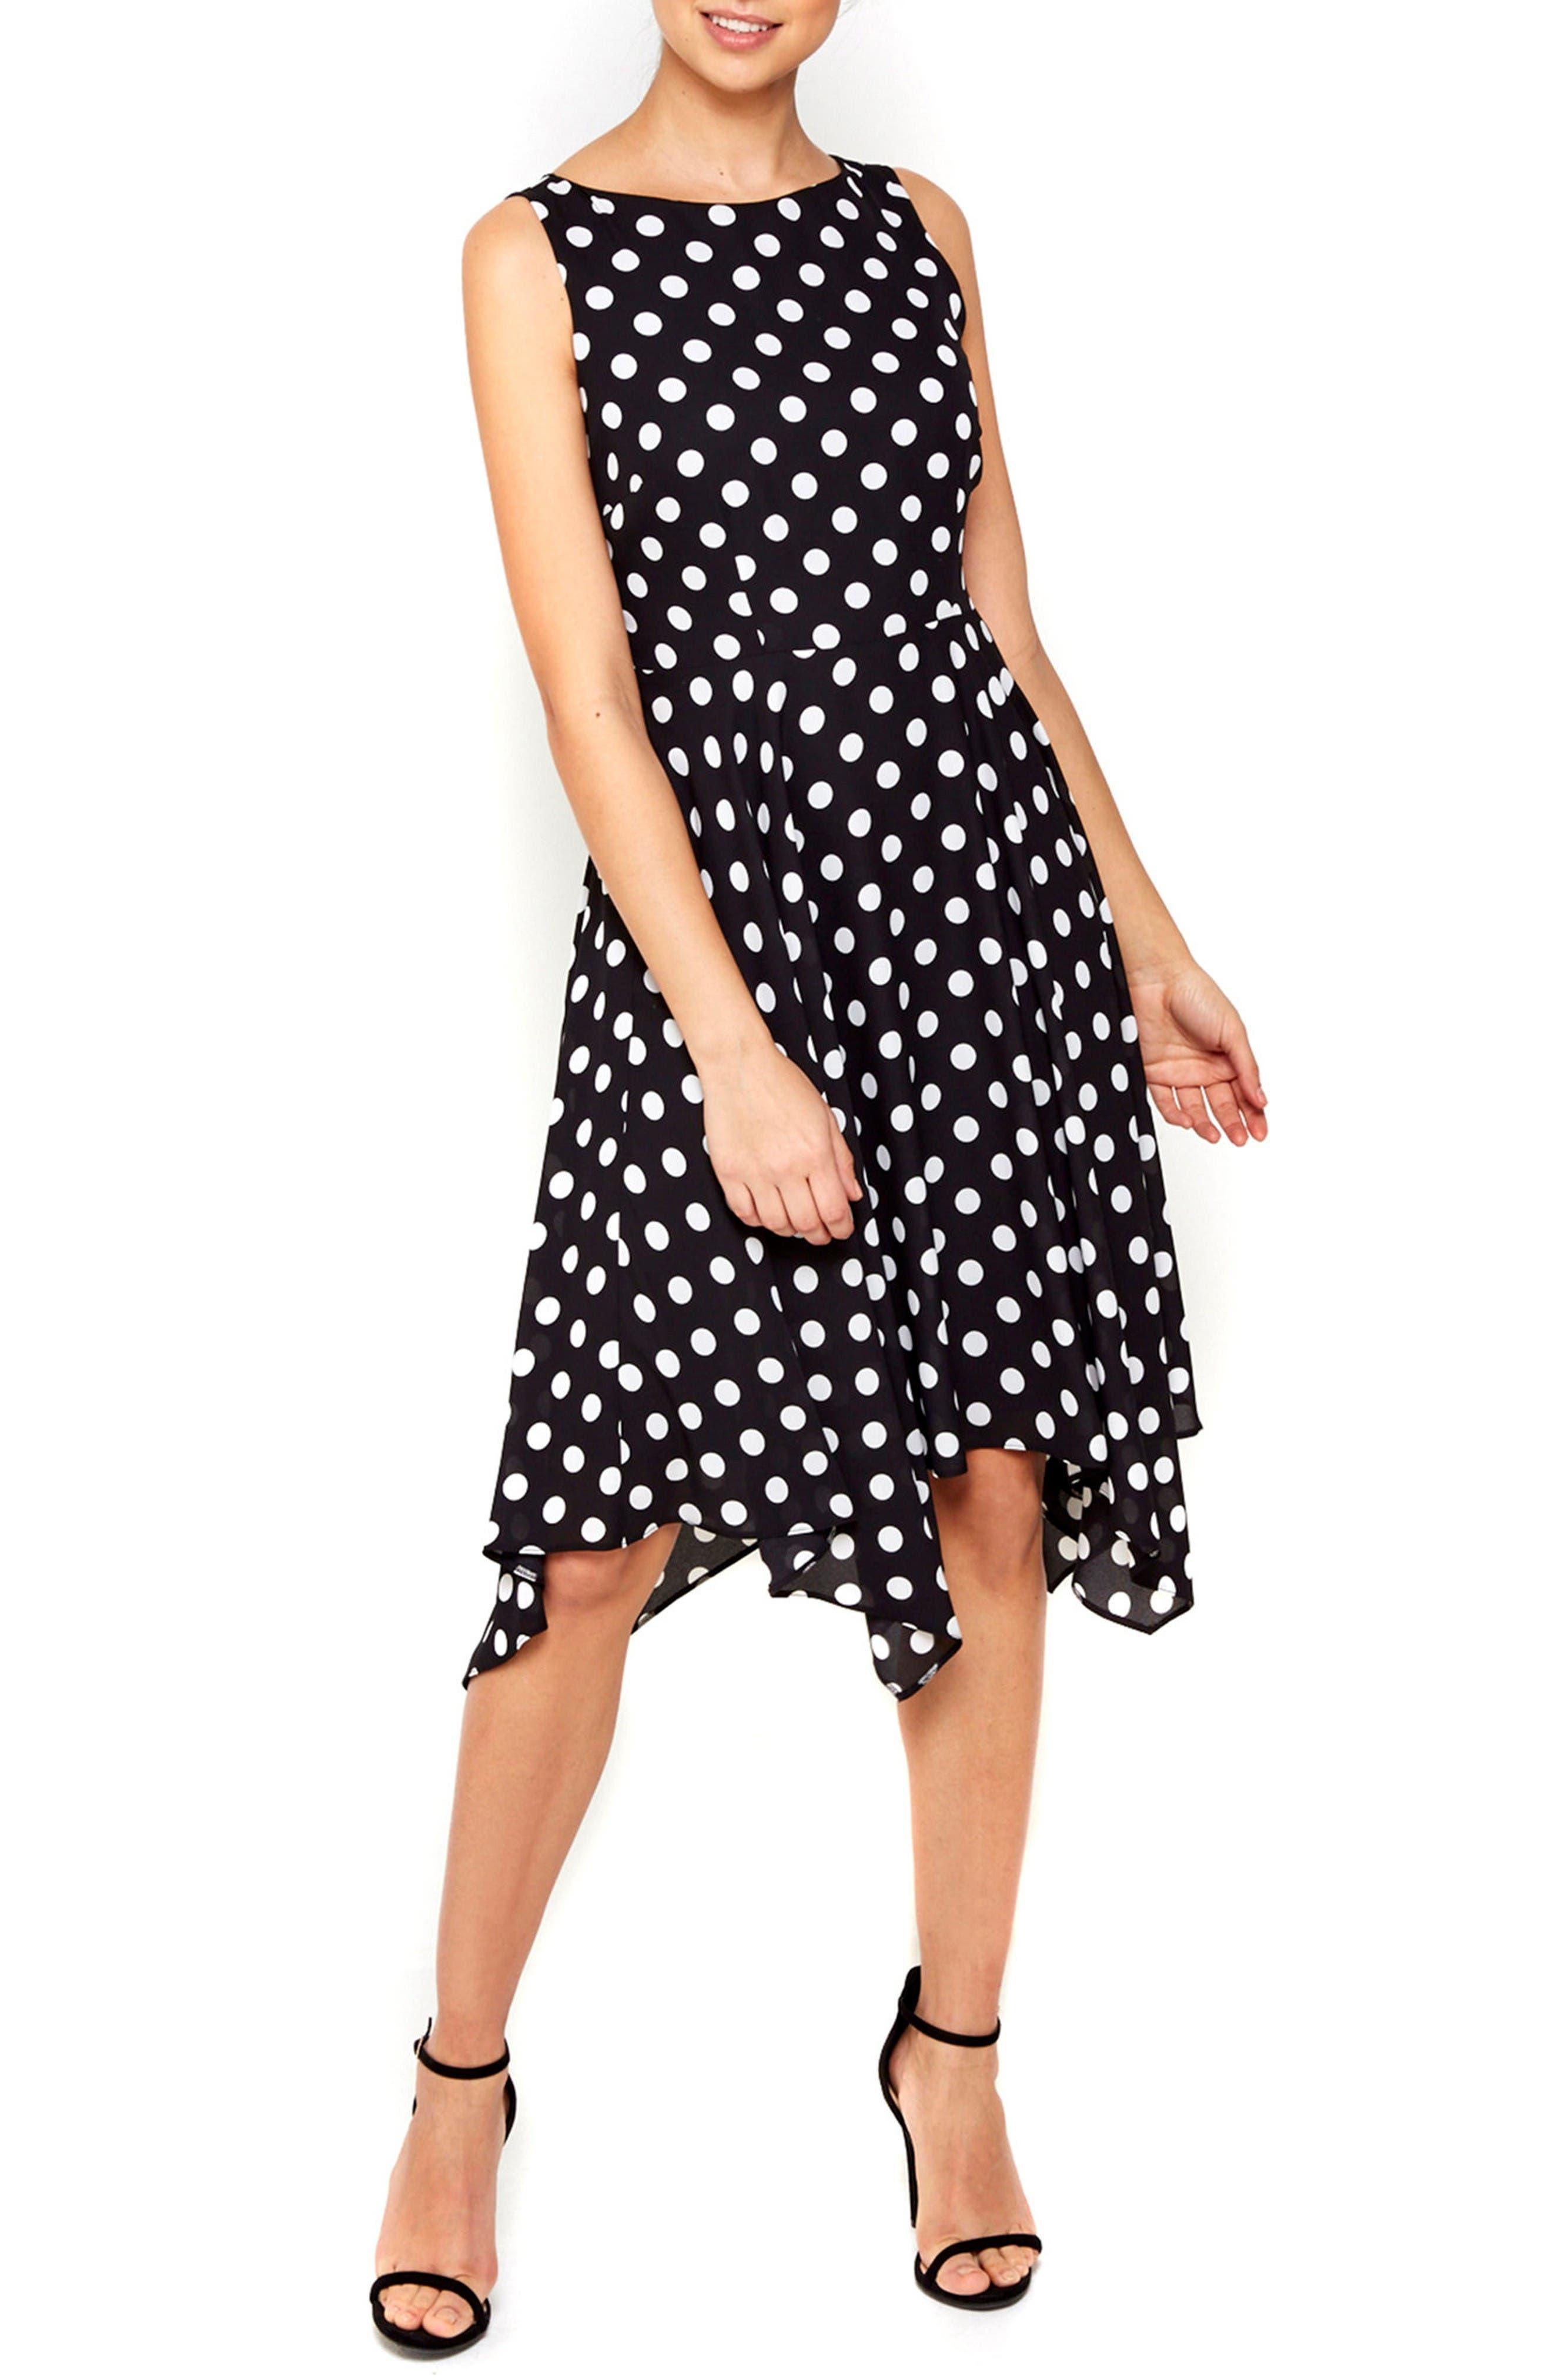 Alternate Image 1 Selected - Wallis Dot Print Handkerchief Hem Dress